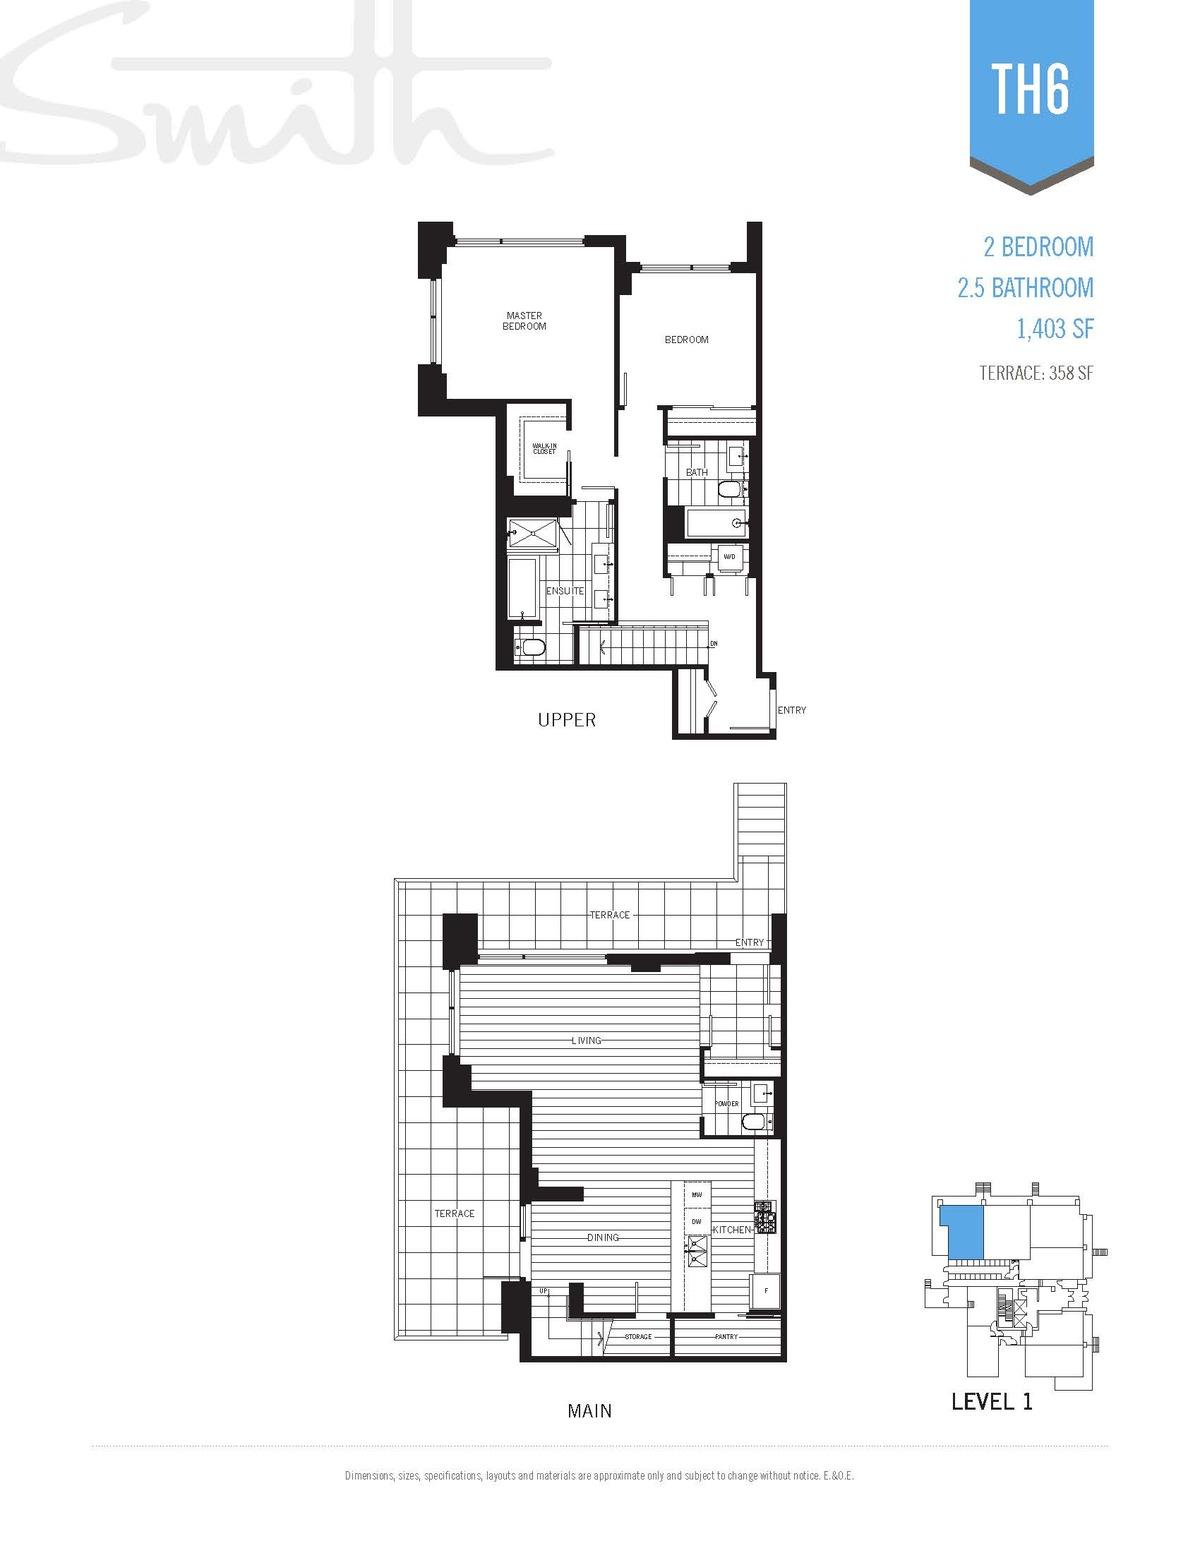 Smith Floorplan TH6